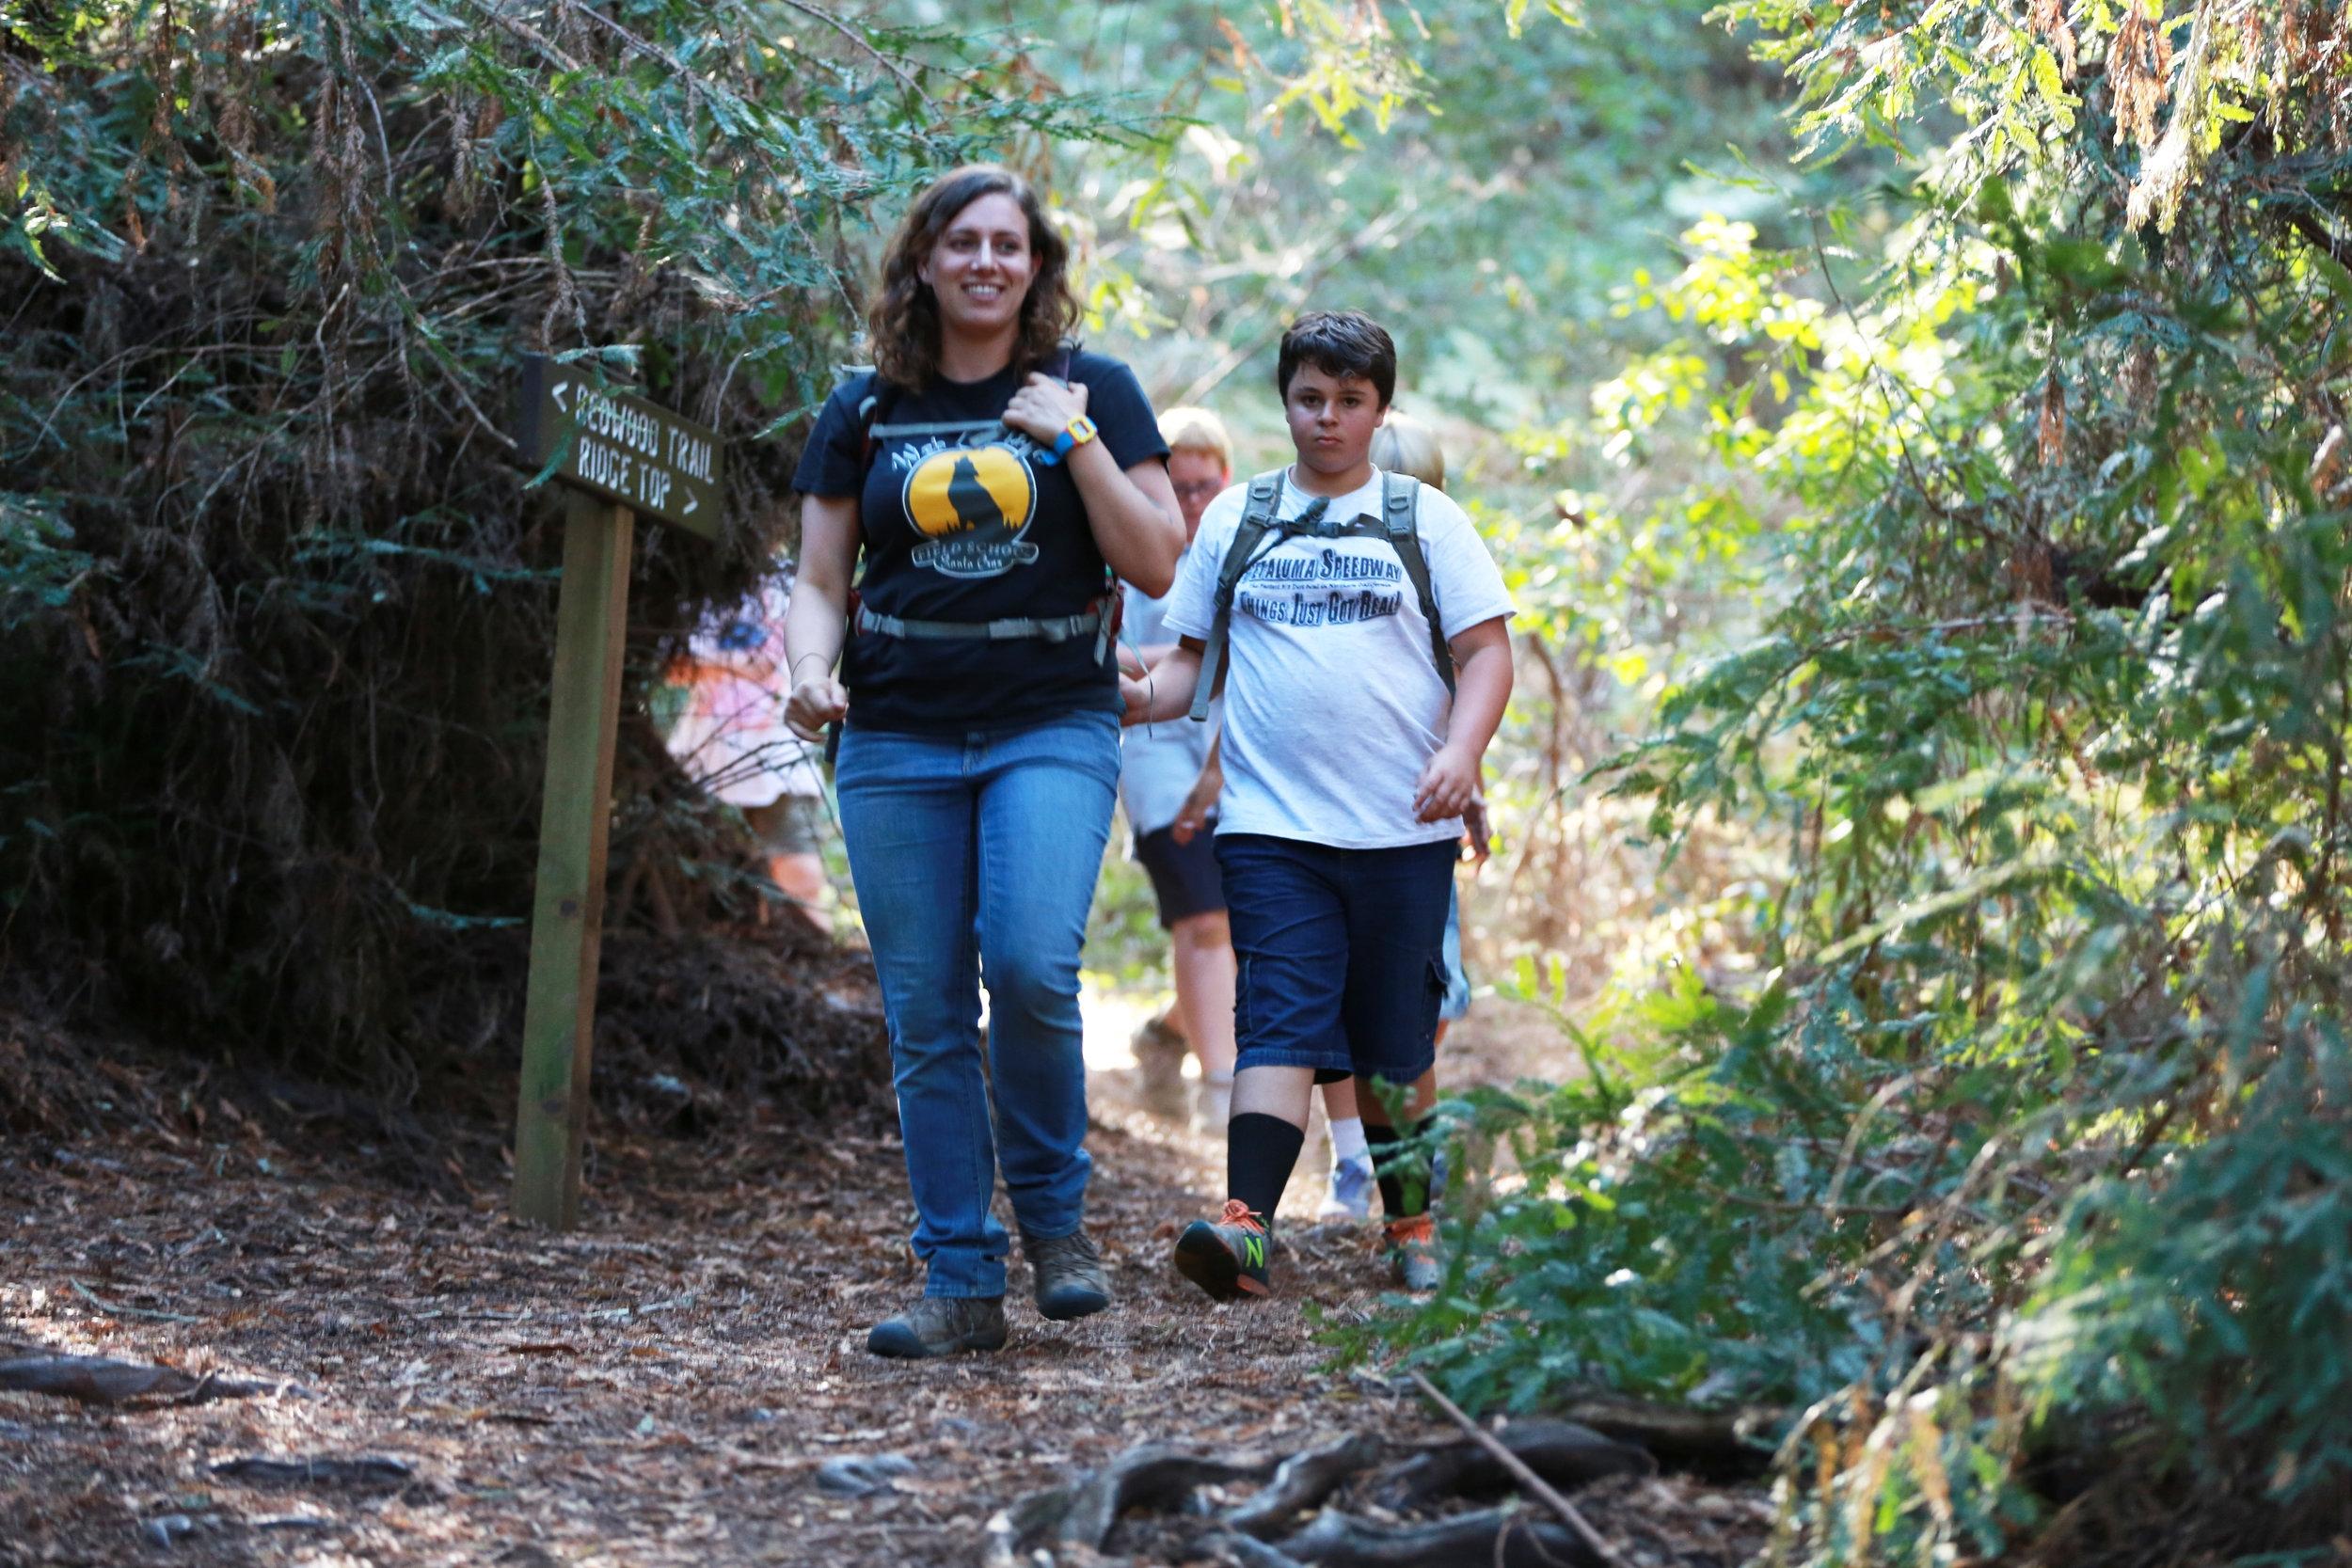 WOLF School Naturalist Leads California Outdoor Science School Trail Hike